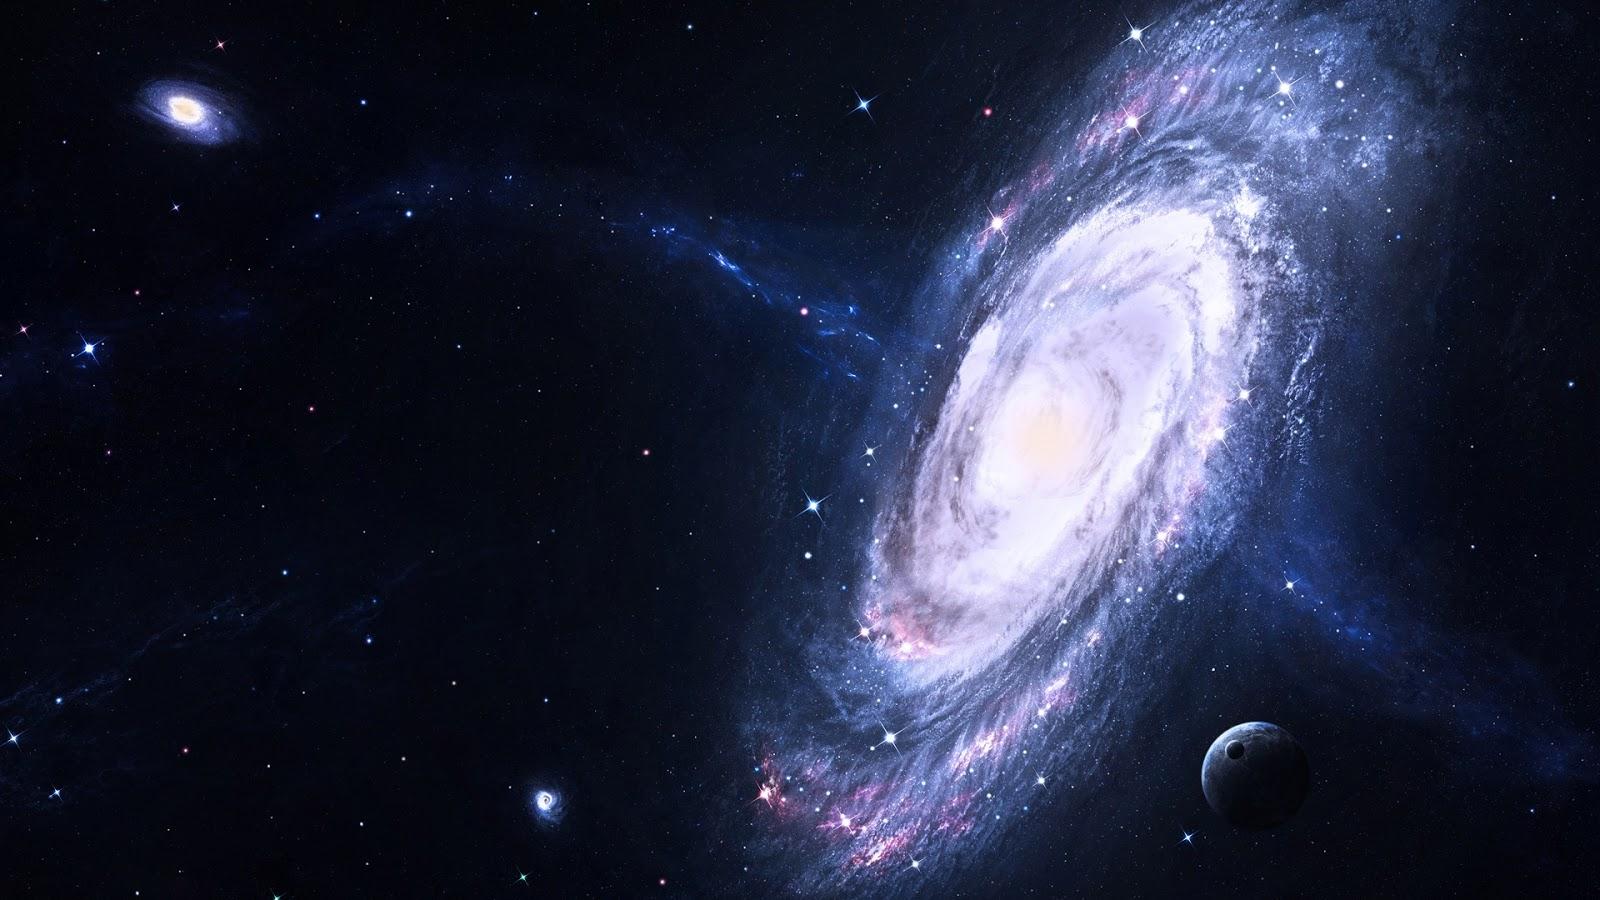 Galaxy hd wallpapers 1080p wallpapersafari - Space wallpaper 1600x900 ...